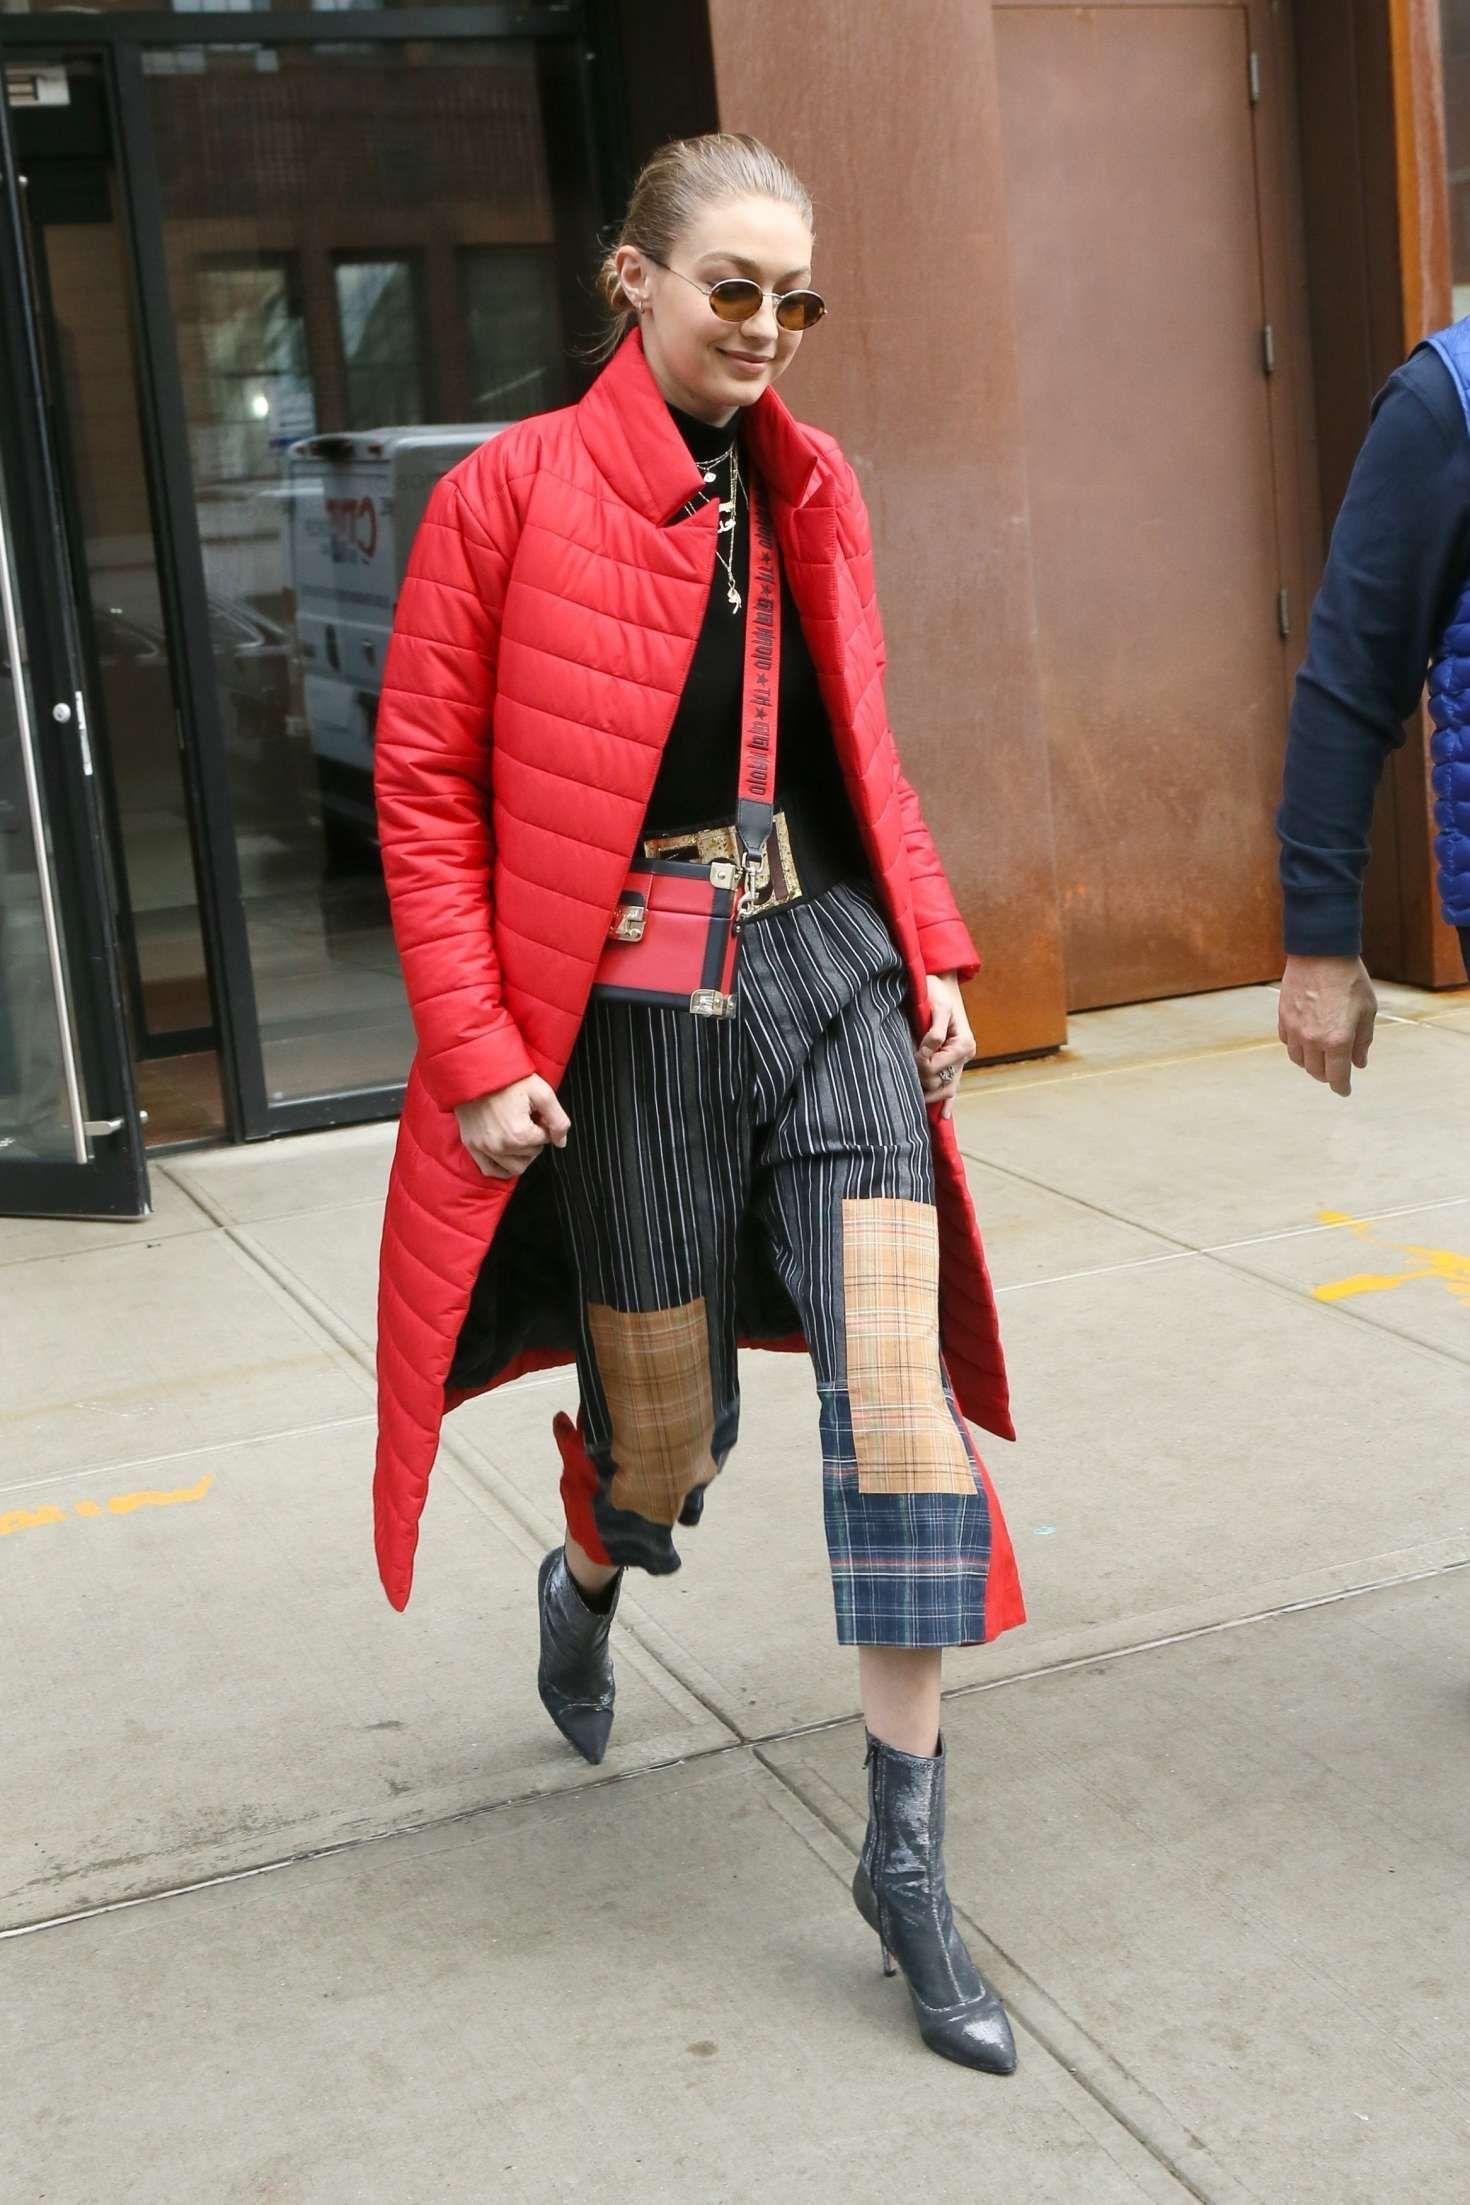 a647b0b6 Gigi Hadid Leaving her apartment in New York 01/23/2018. Celebrity Fashion